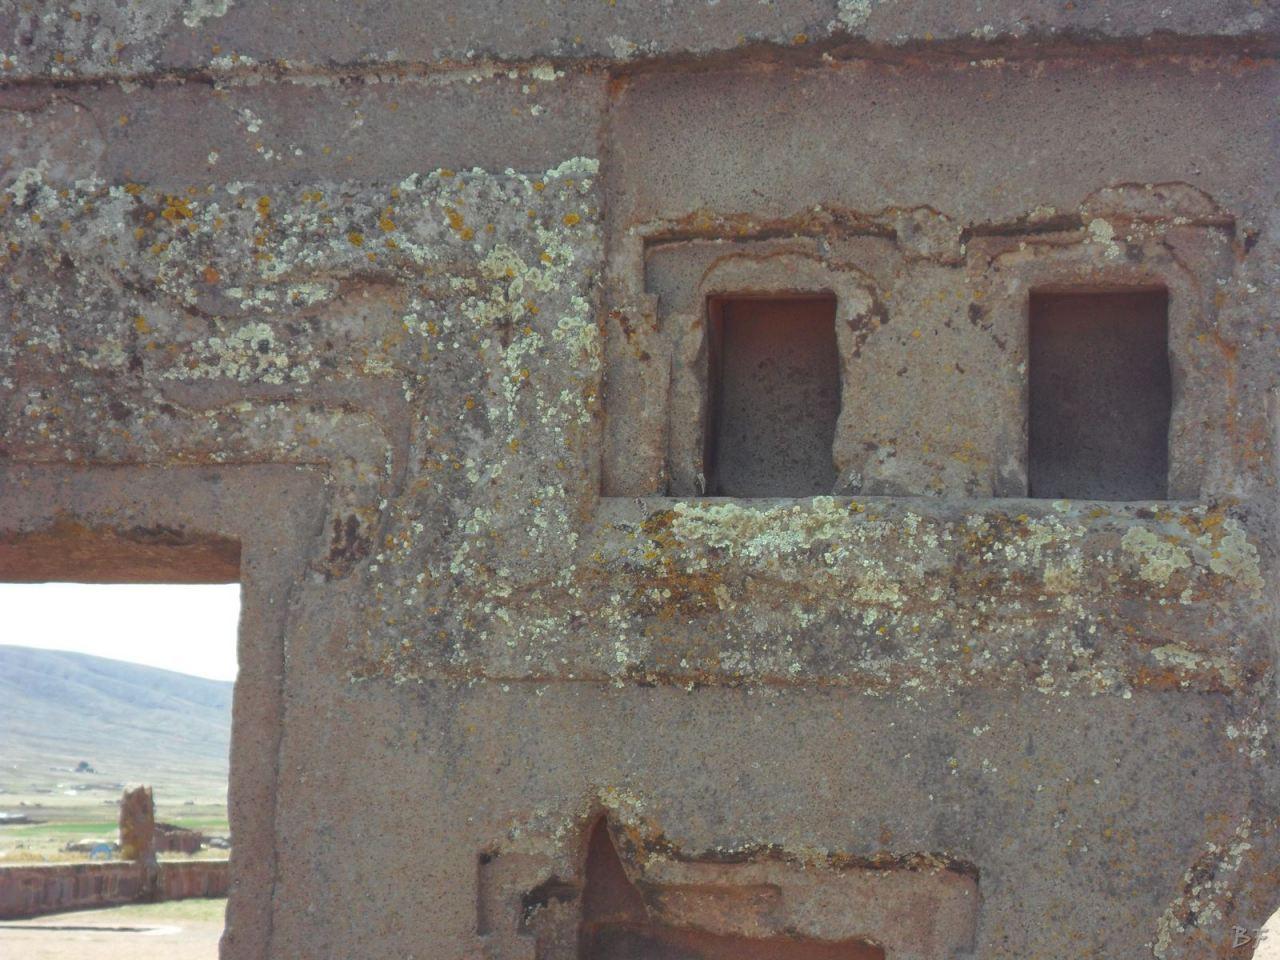 Sito-Megalitico-Piramide-Akapana-Kalasasaya-Menhir-Tiahuanaco-Bolivia-22